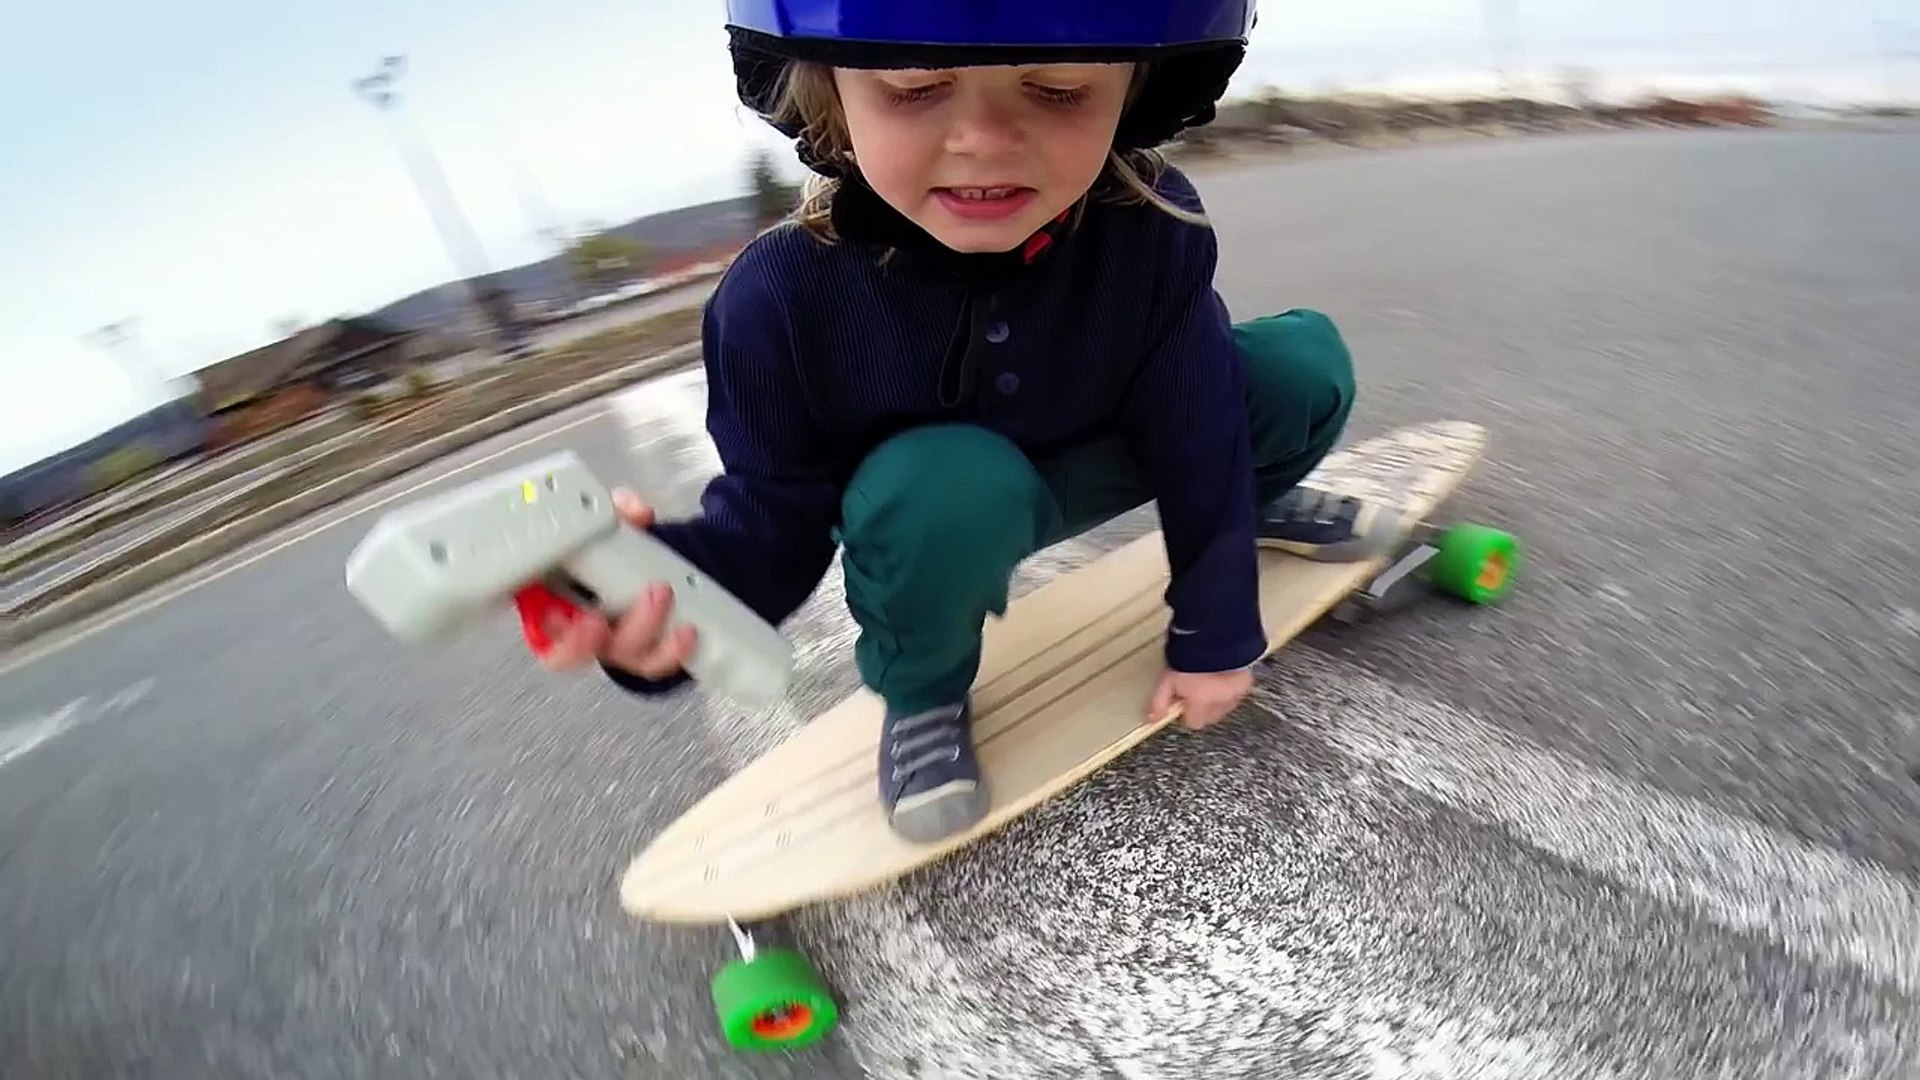 GoPro: Electric Skateboard Kid - TV Commercial